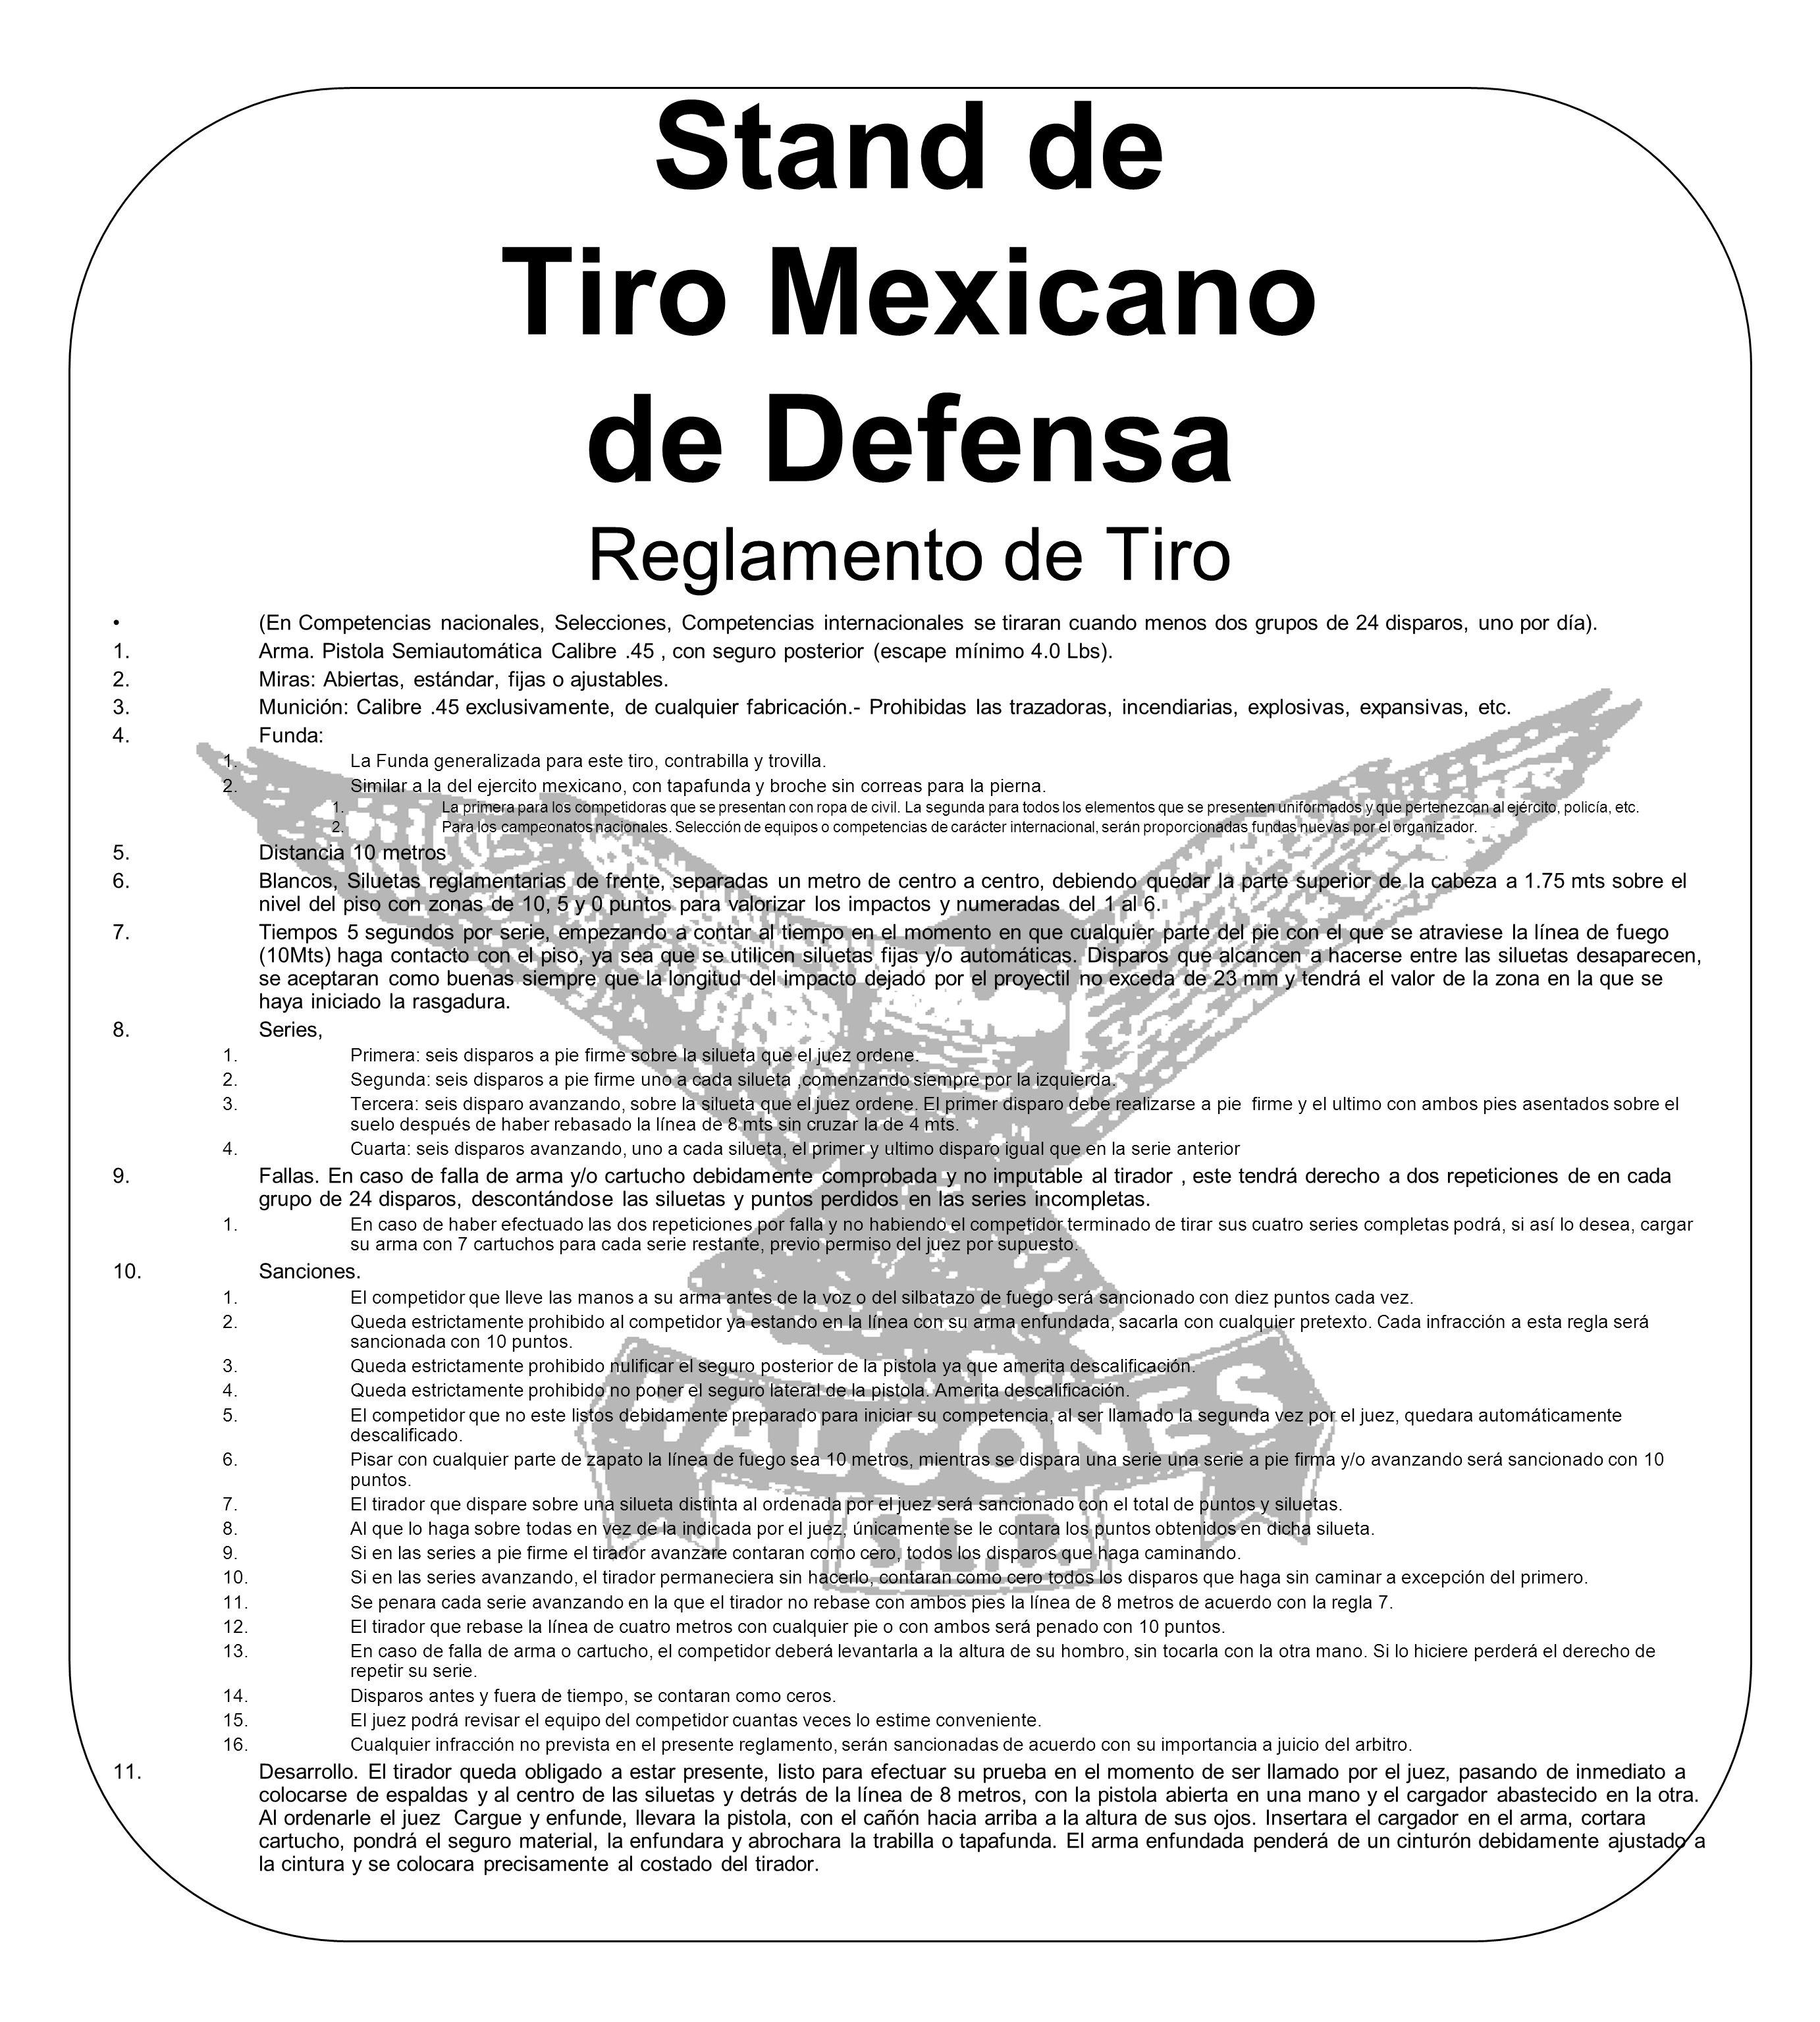 Stand de Tiro Mexicano de Defensa Reglamento de Tiro (En Competencias nacionales, Selecciones, Competencias internacionales se tiraran cuando menos do